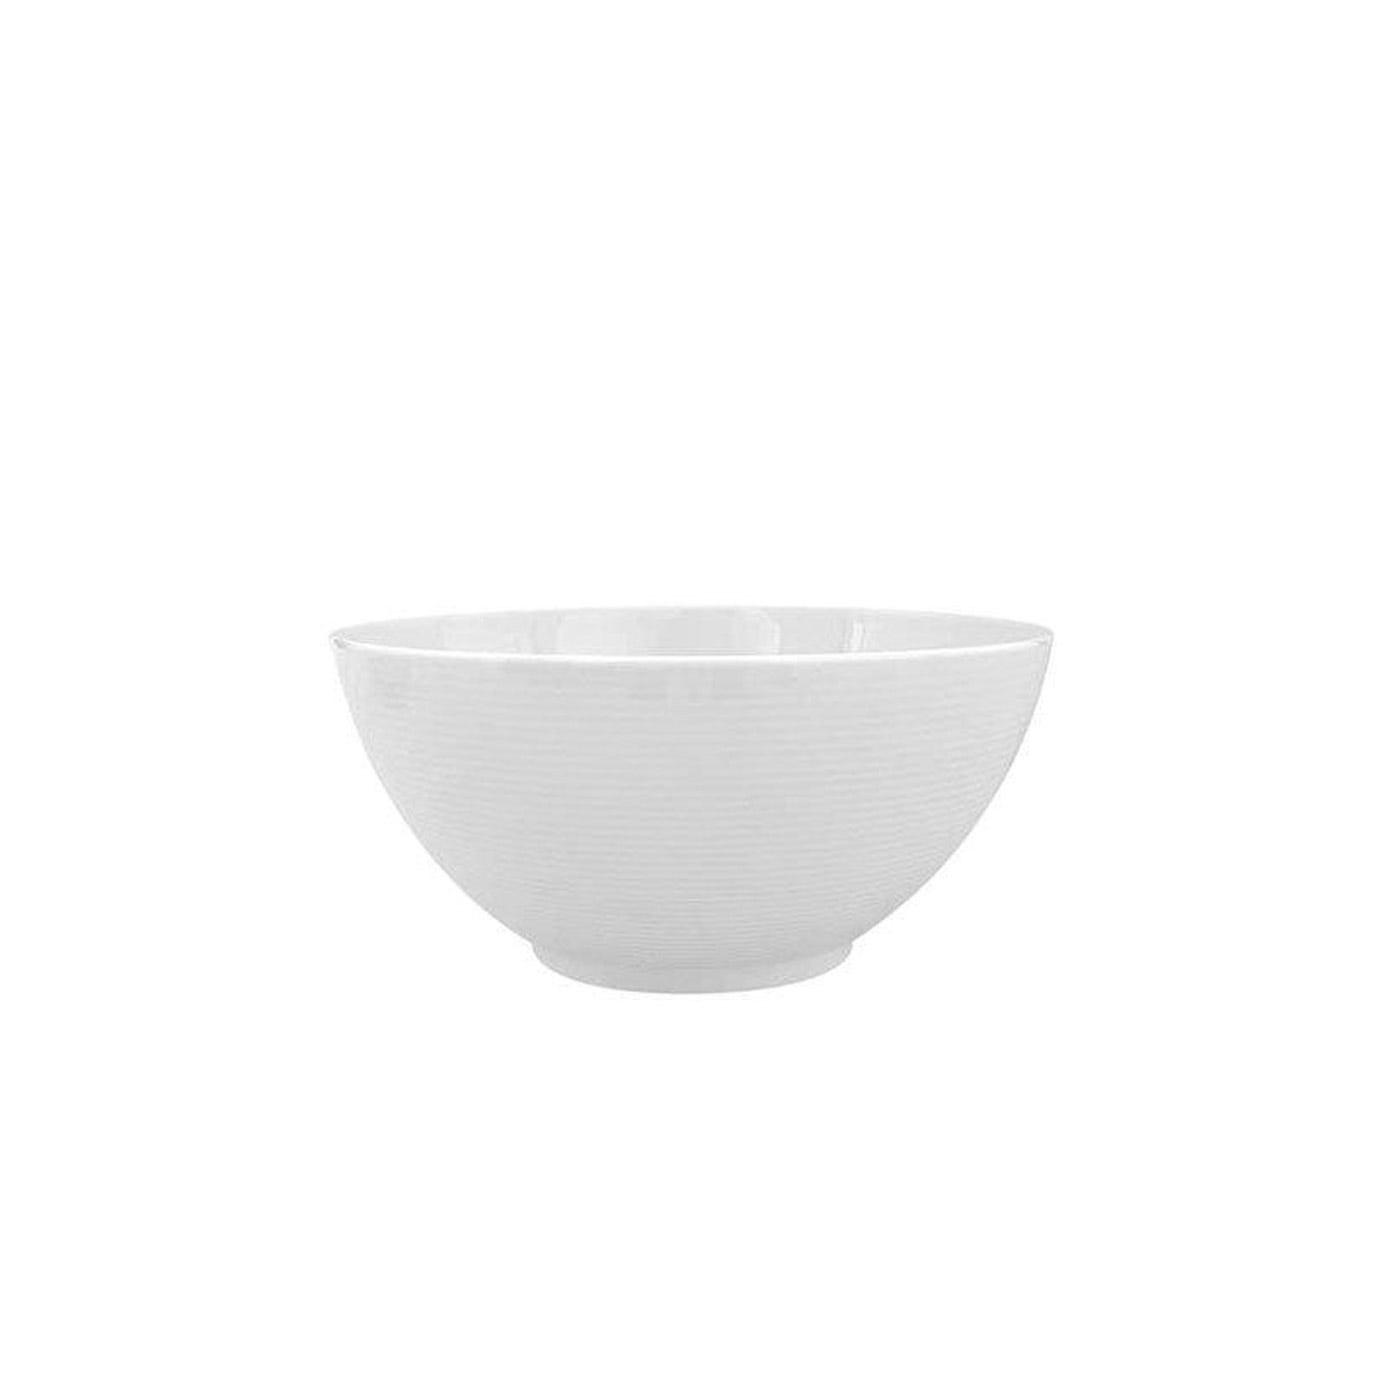 Loft White Round Bowl